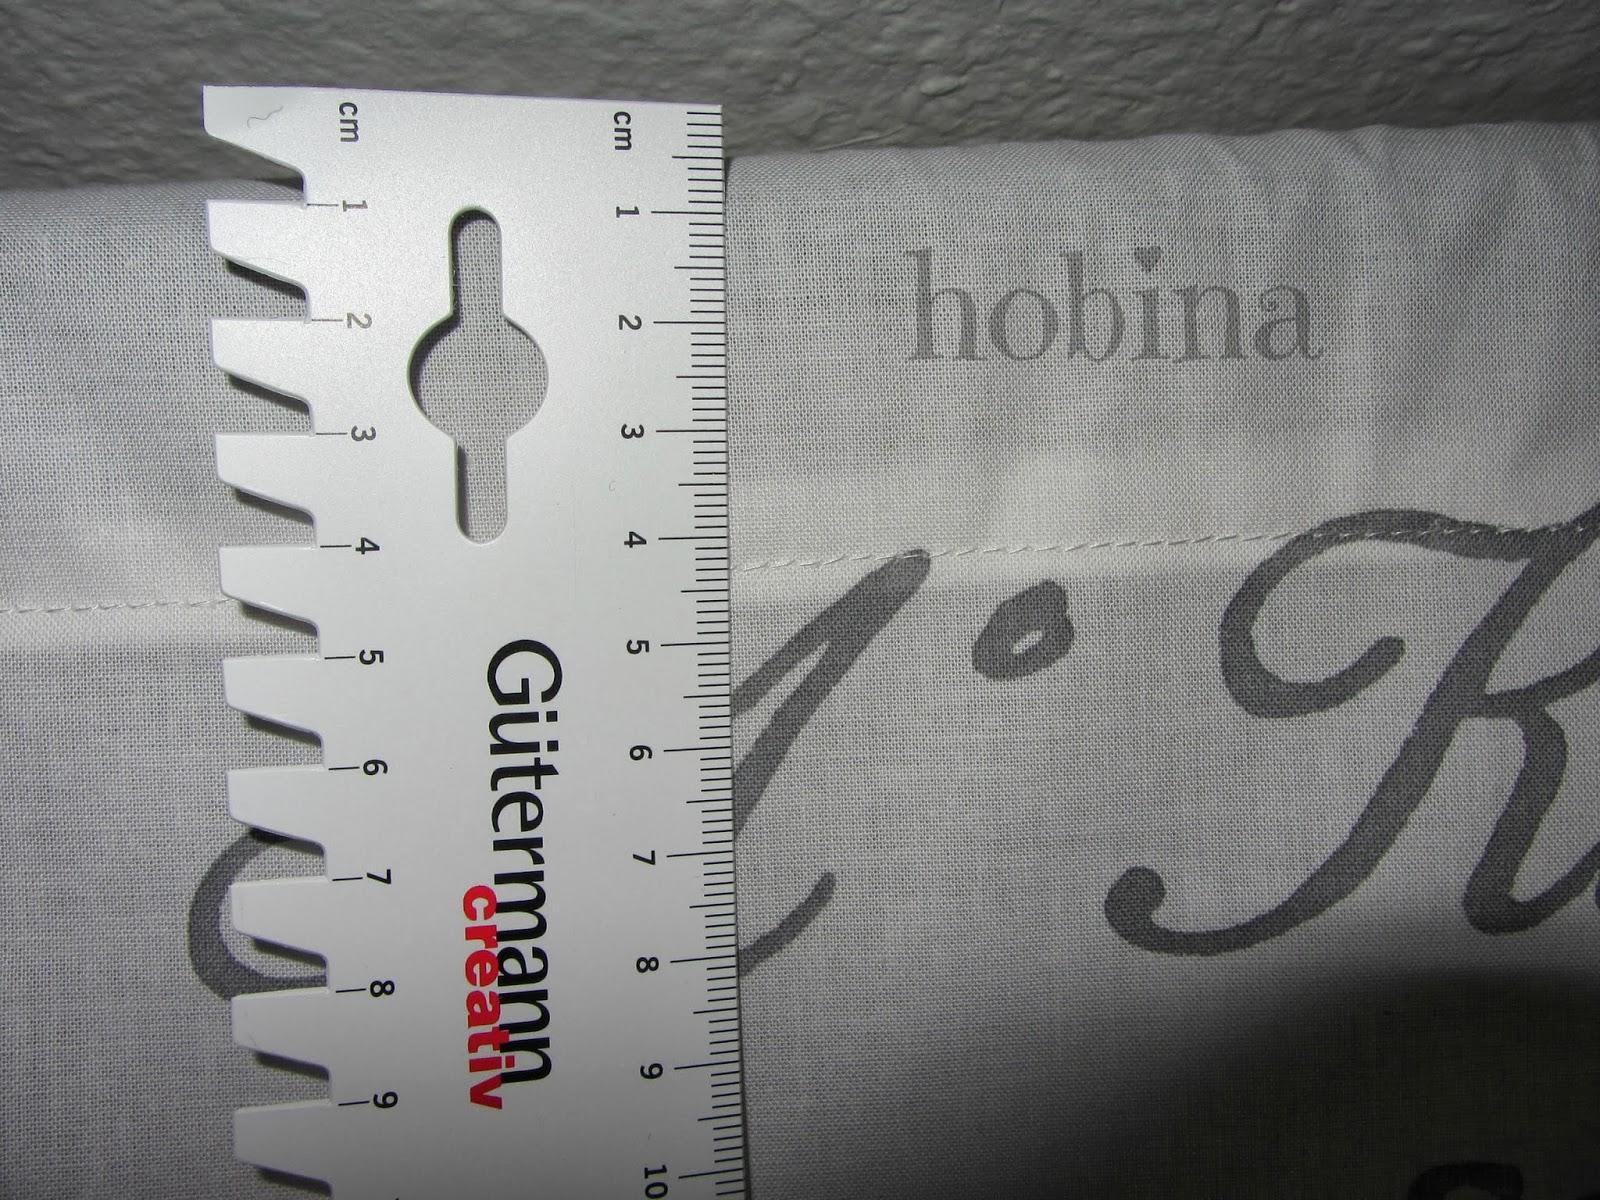 Elegant Tedox Gardinenstangen Design